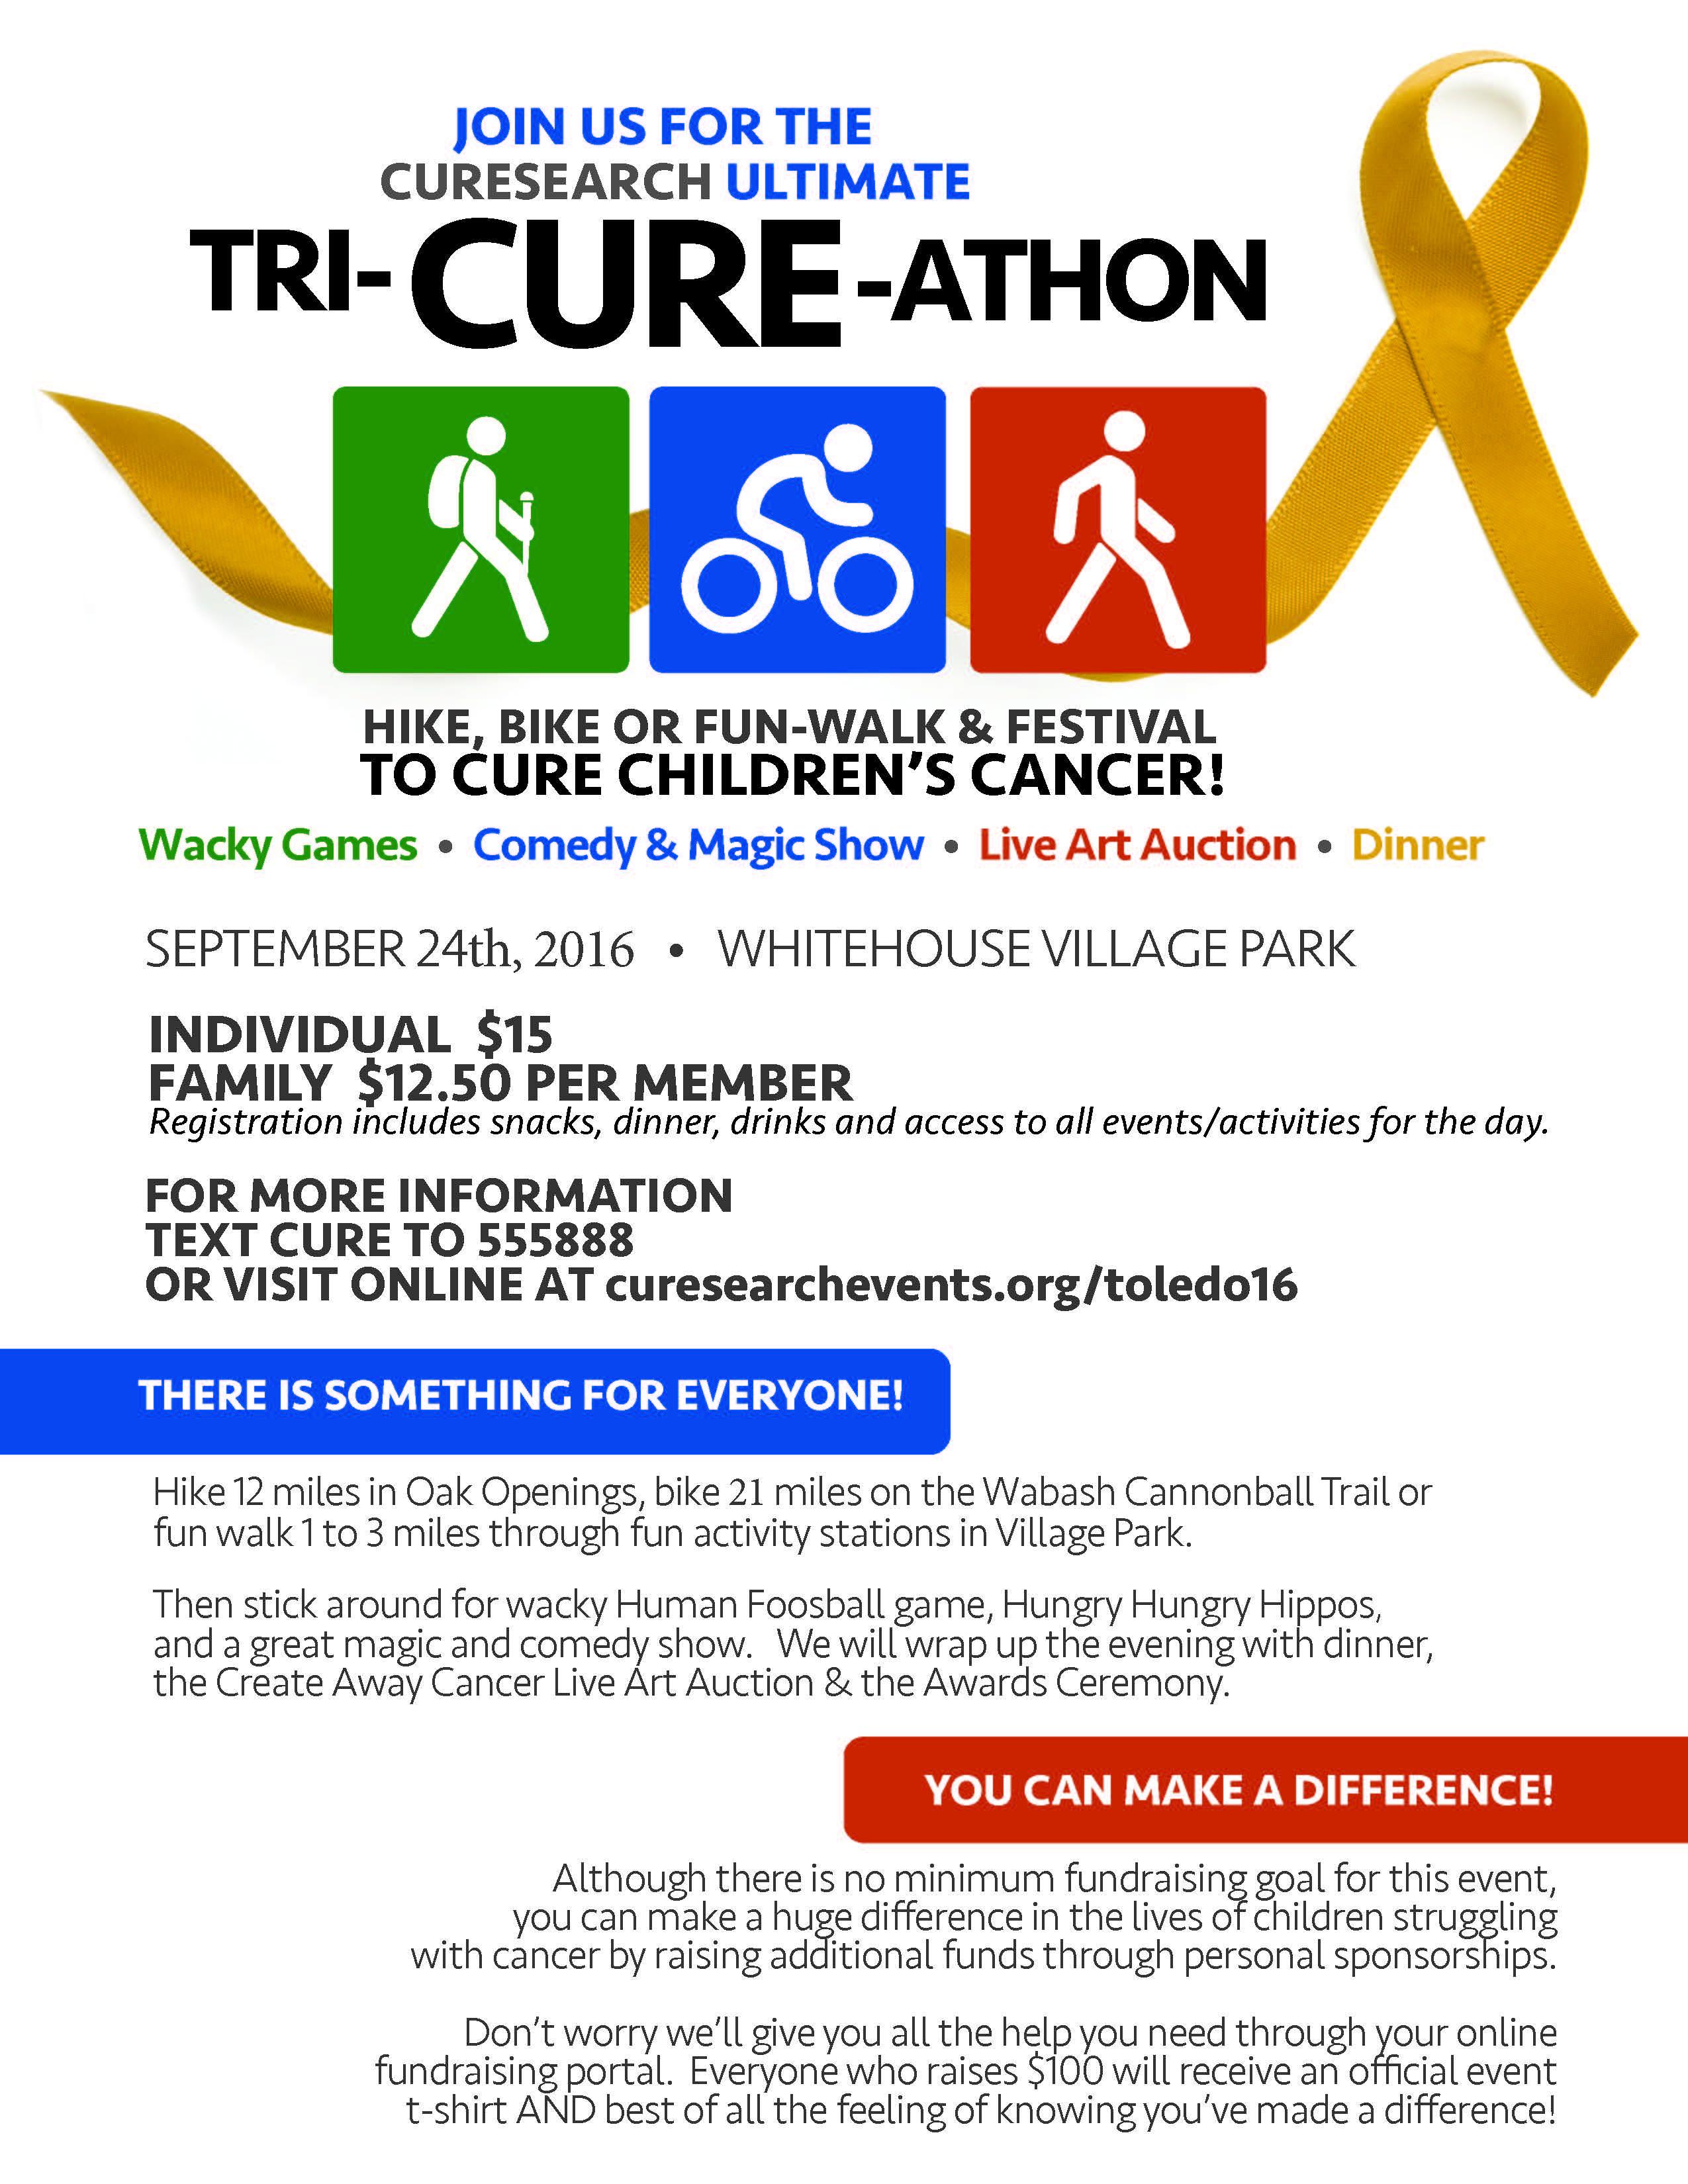 TriCureathon Event Information